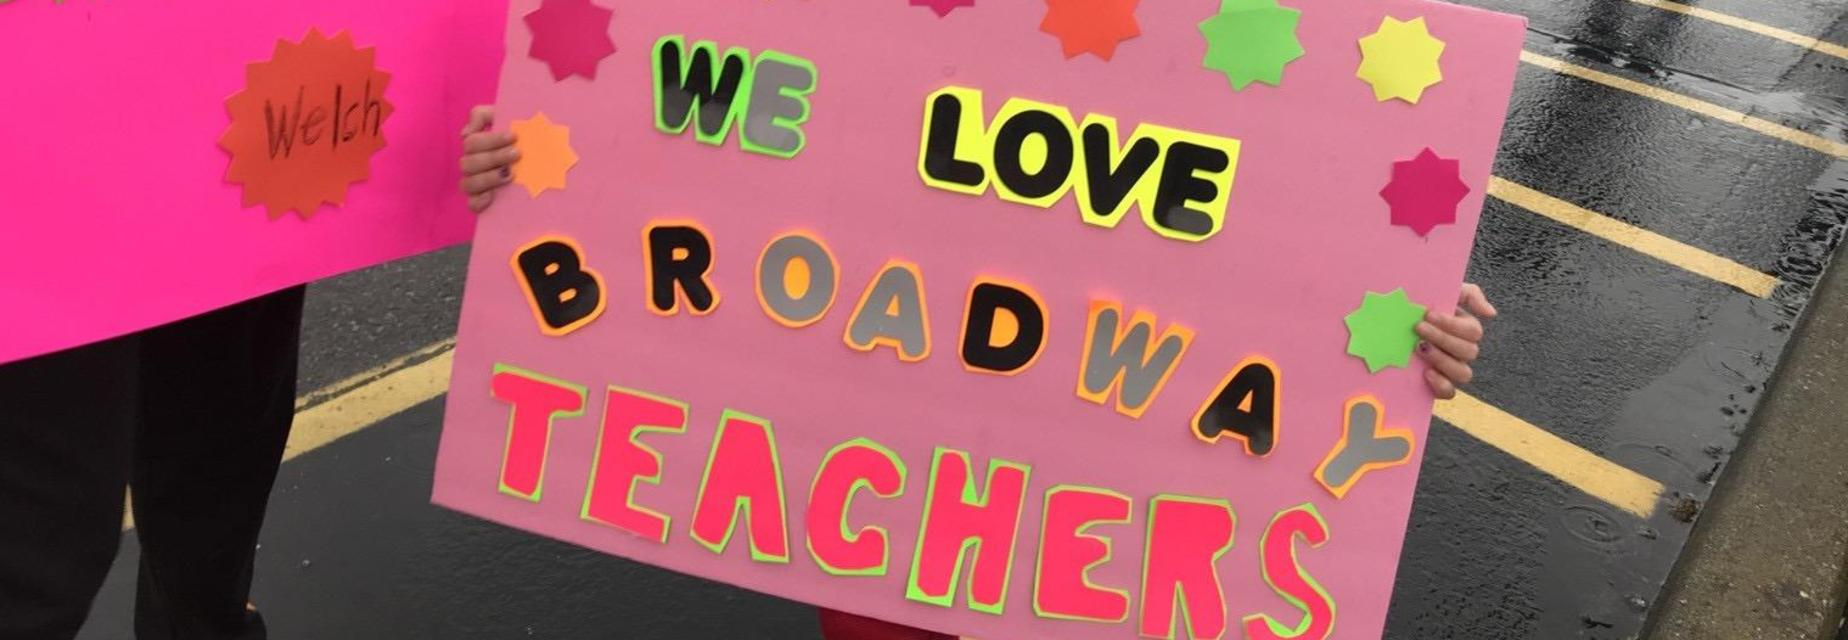 We love Broadway teachers sign